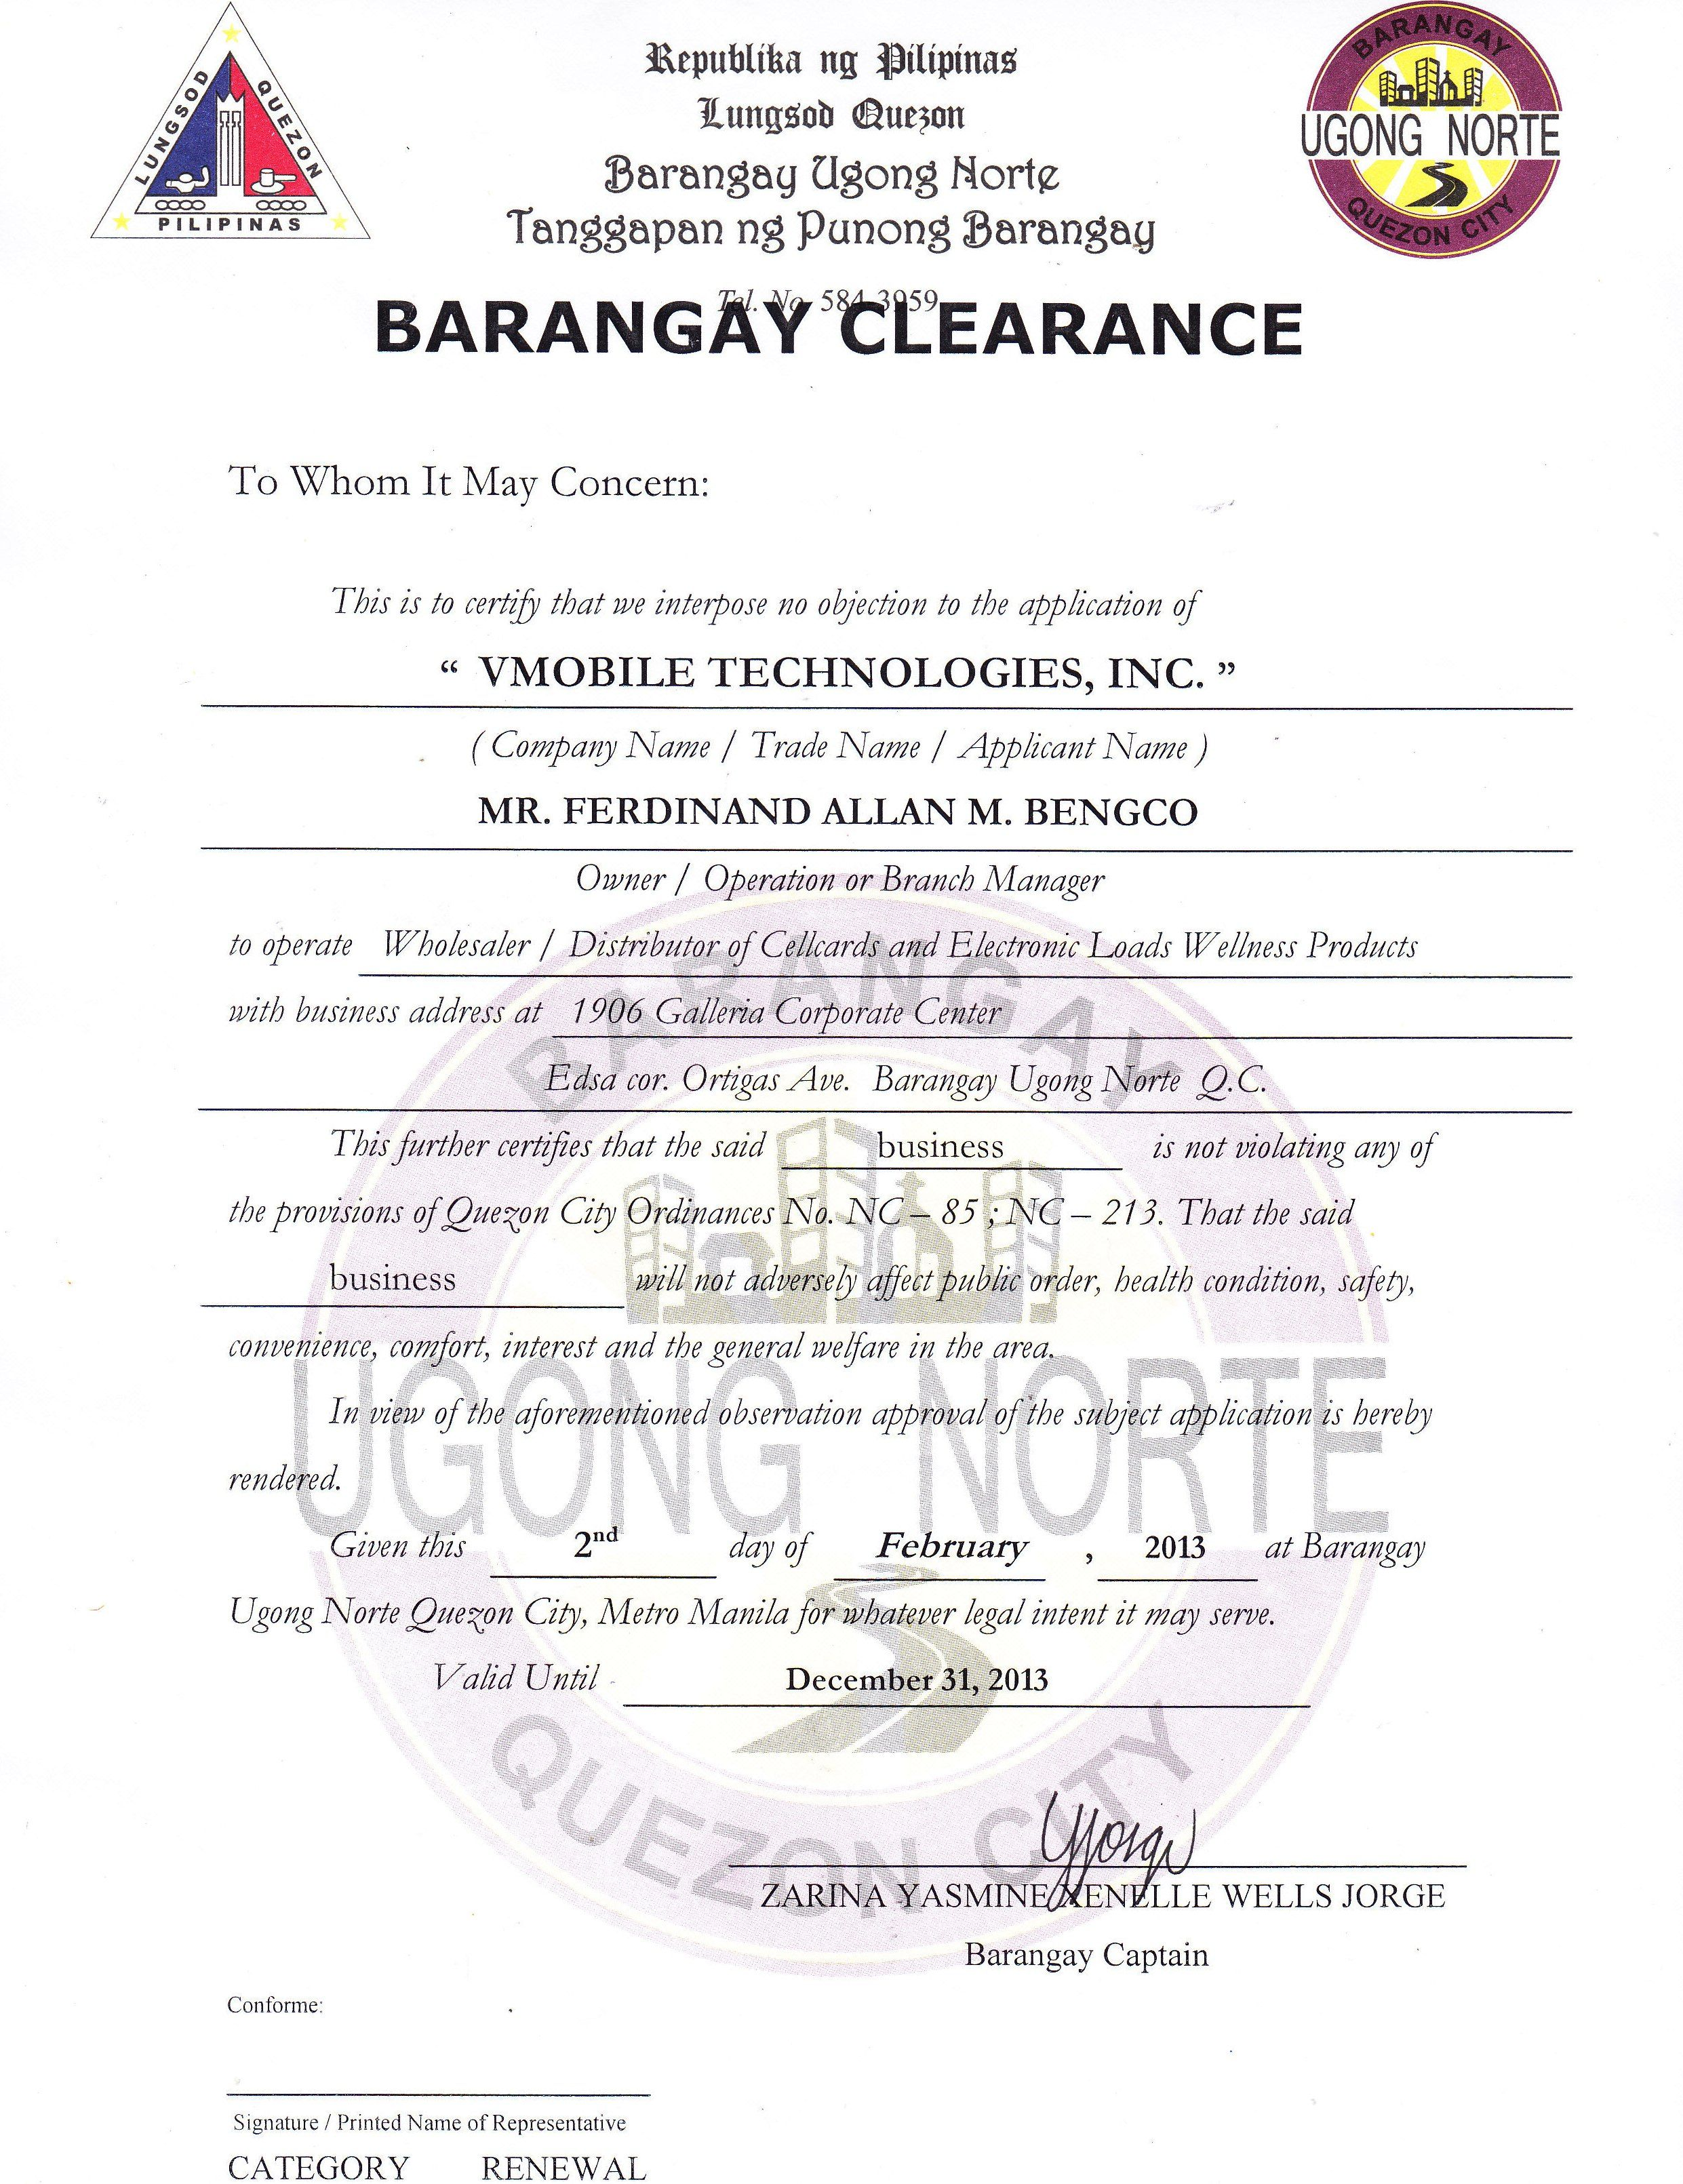 Barangay clearance sample certificate good moral character images barangay clearance sample certificate good moral character images altavistaventures Choice Image